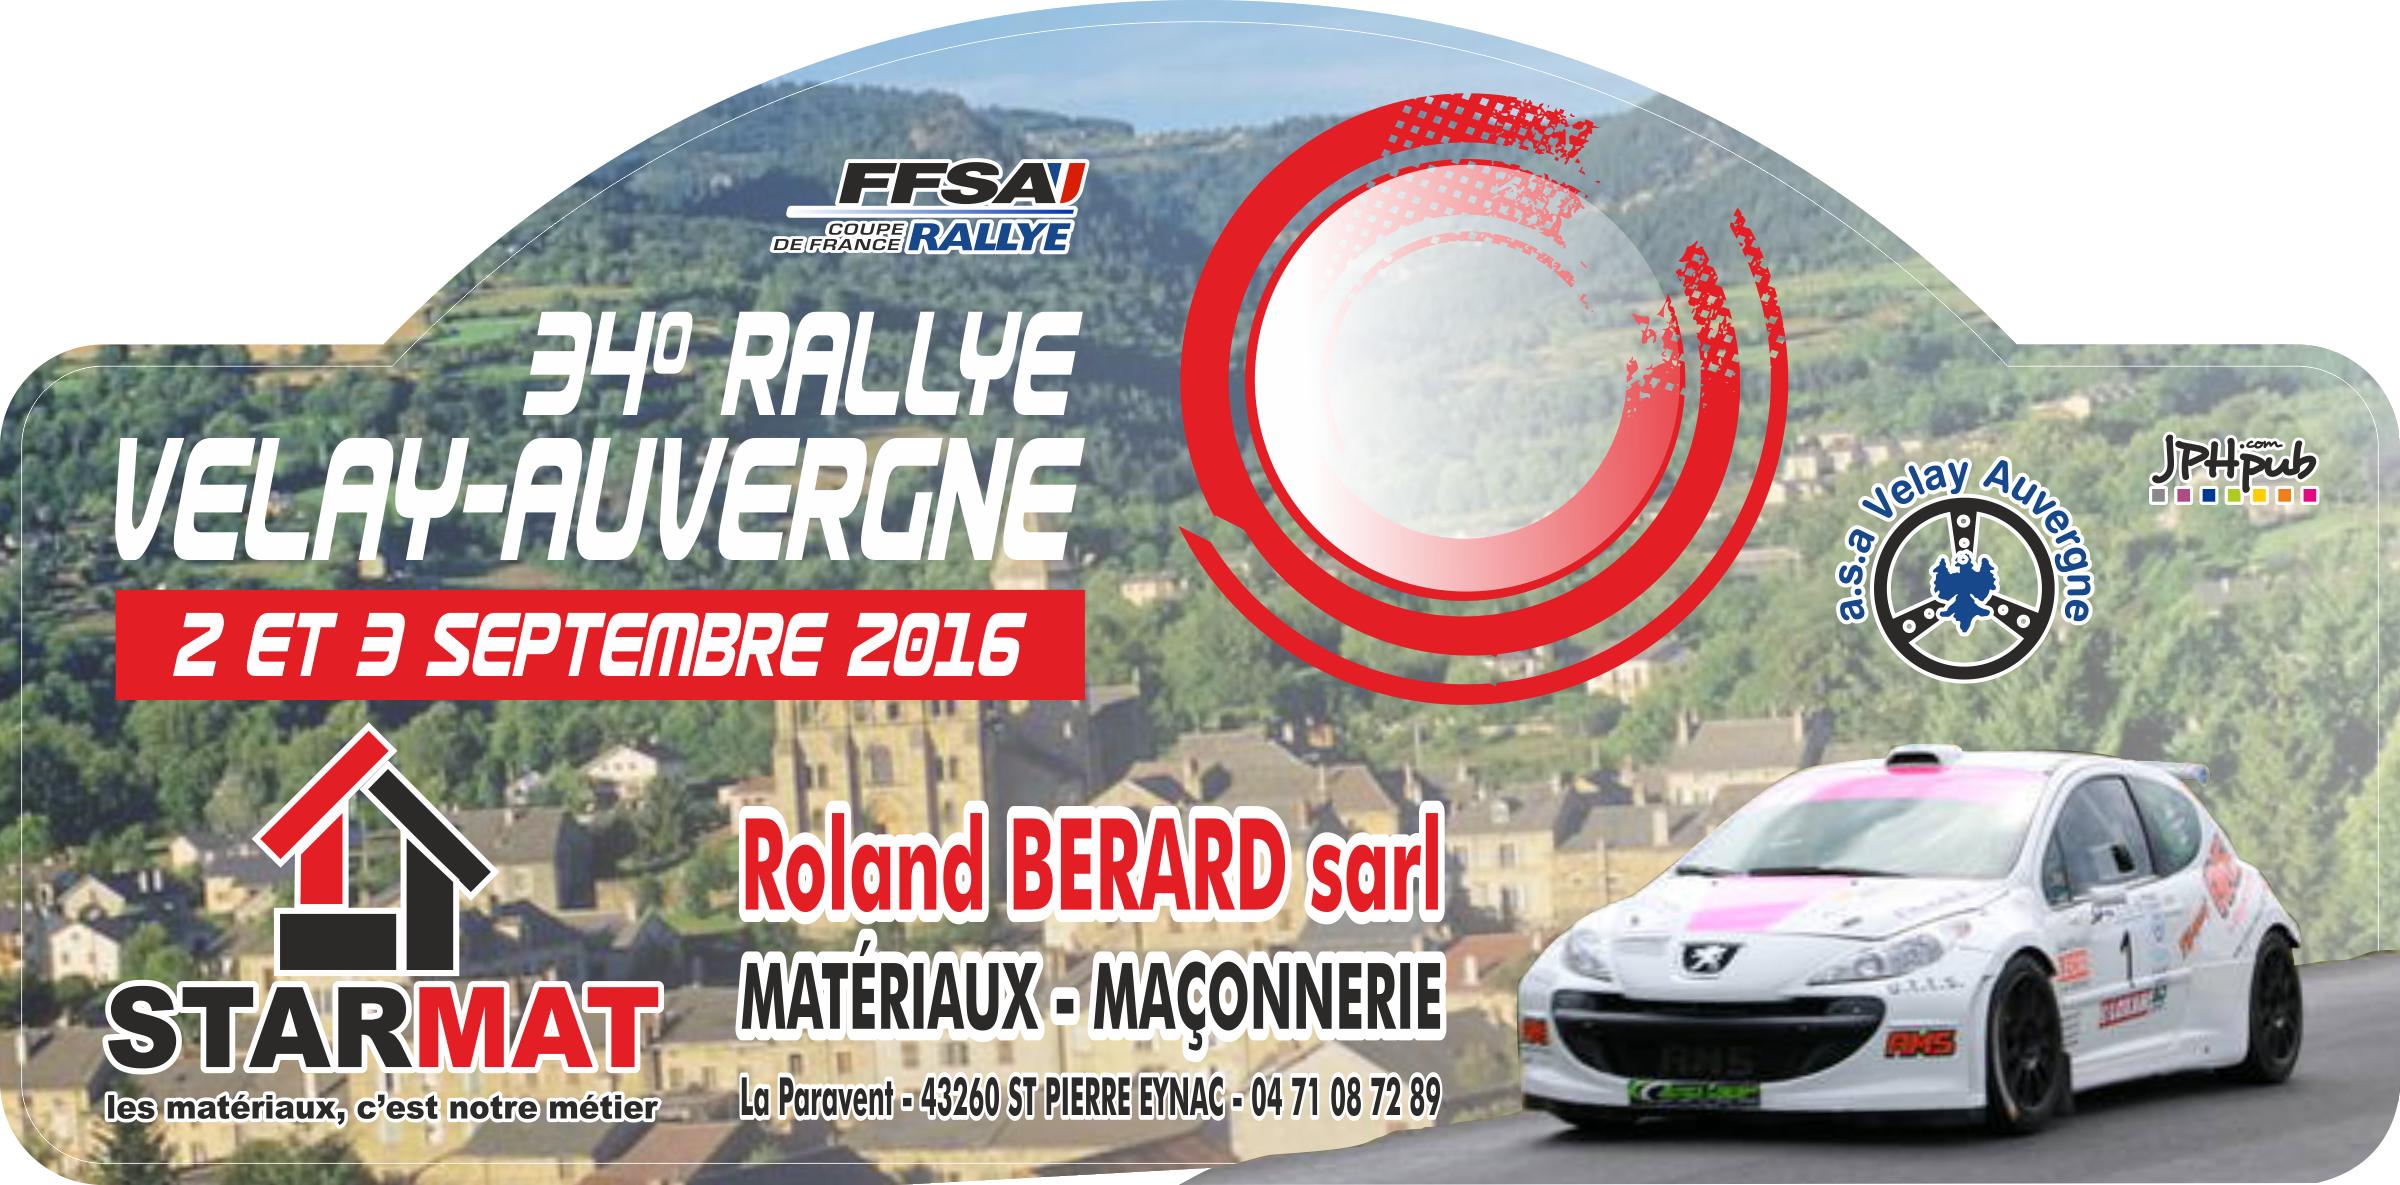 Rallye-Velay-Auvergne-2016